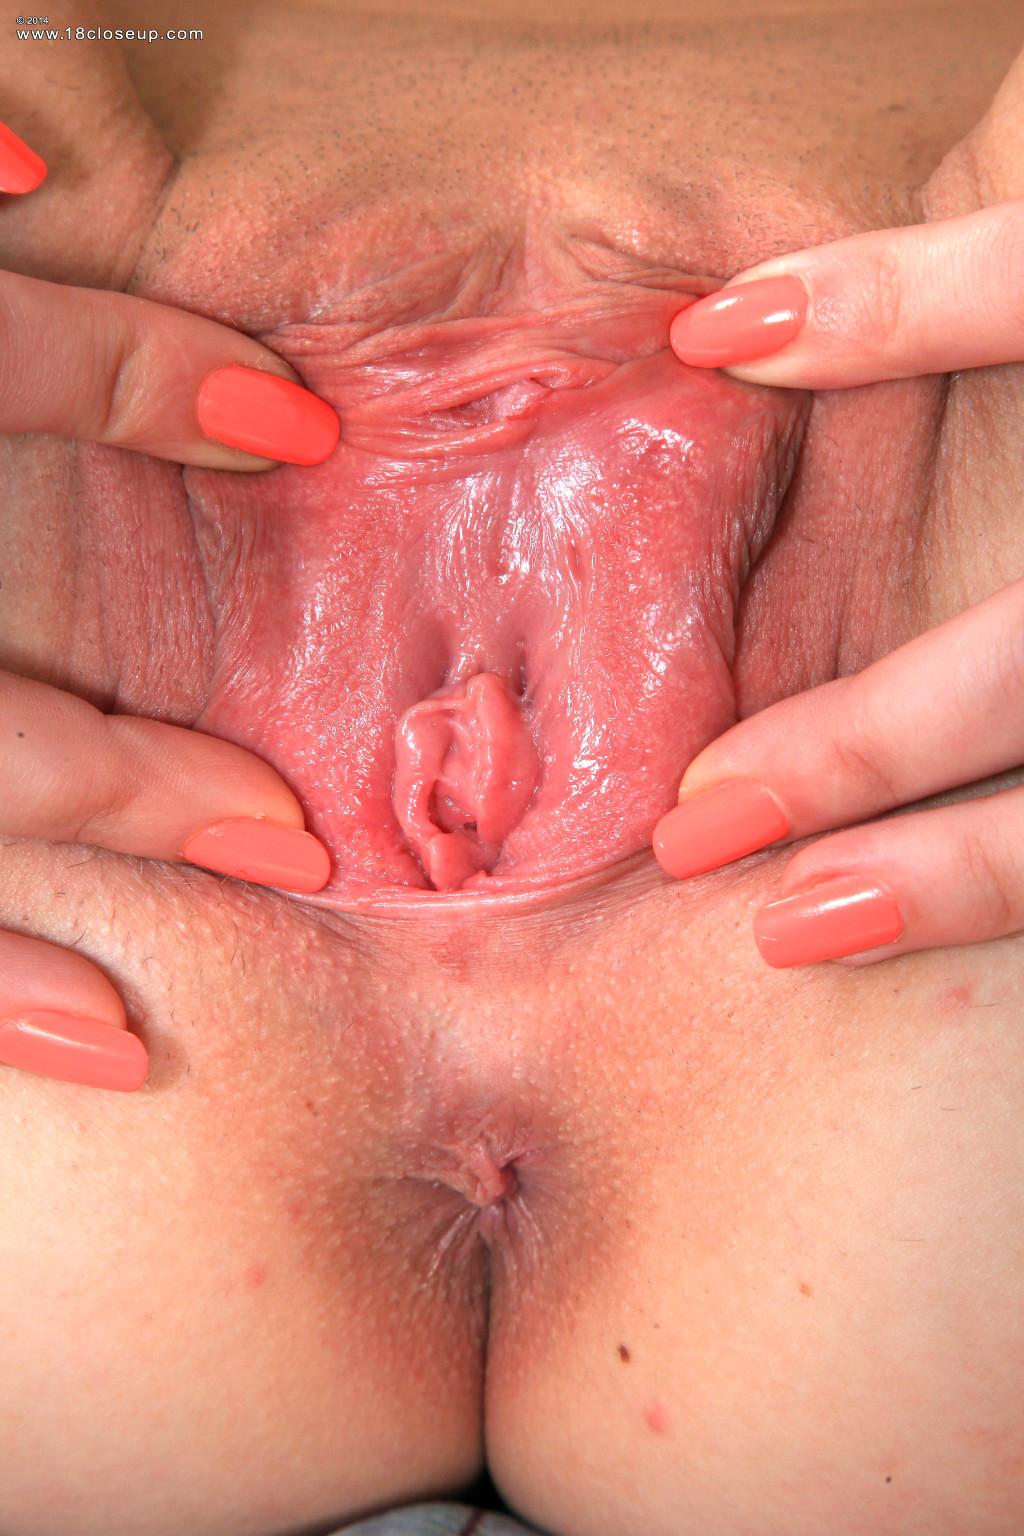 nude girls on snapchat vaginas